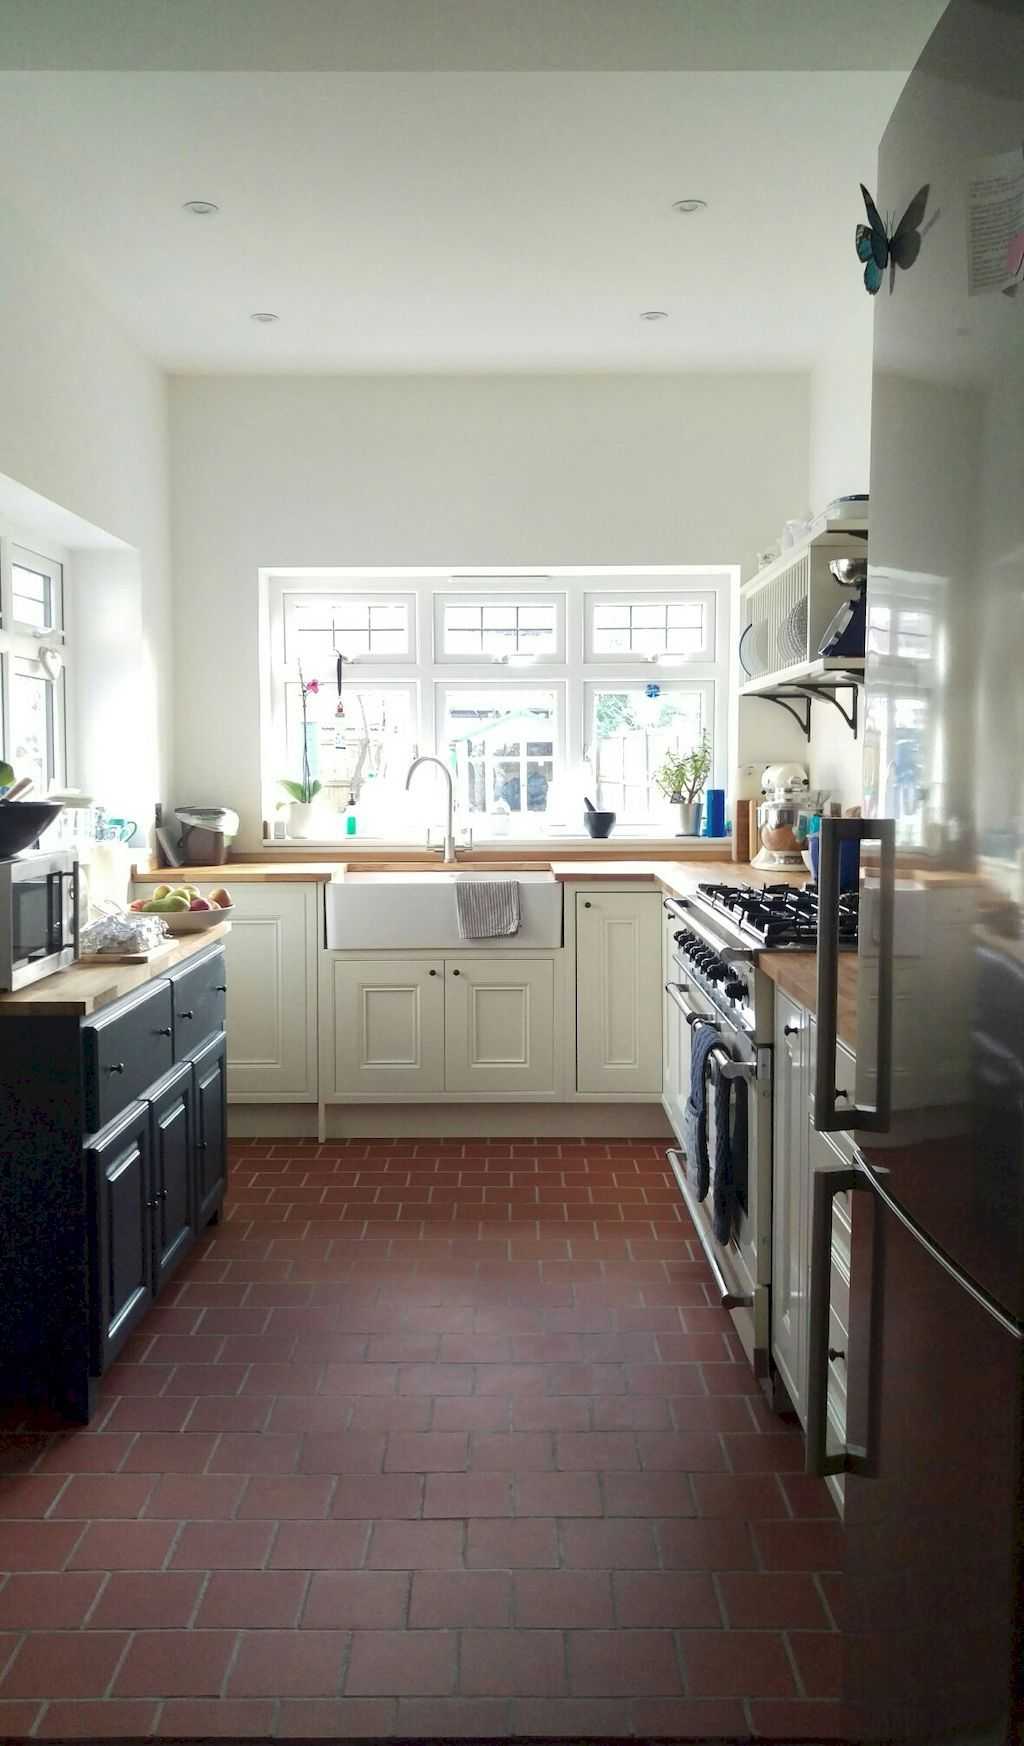 70 Tile Floor Farmhouse Kitchen Decor Ideas With Images